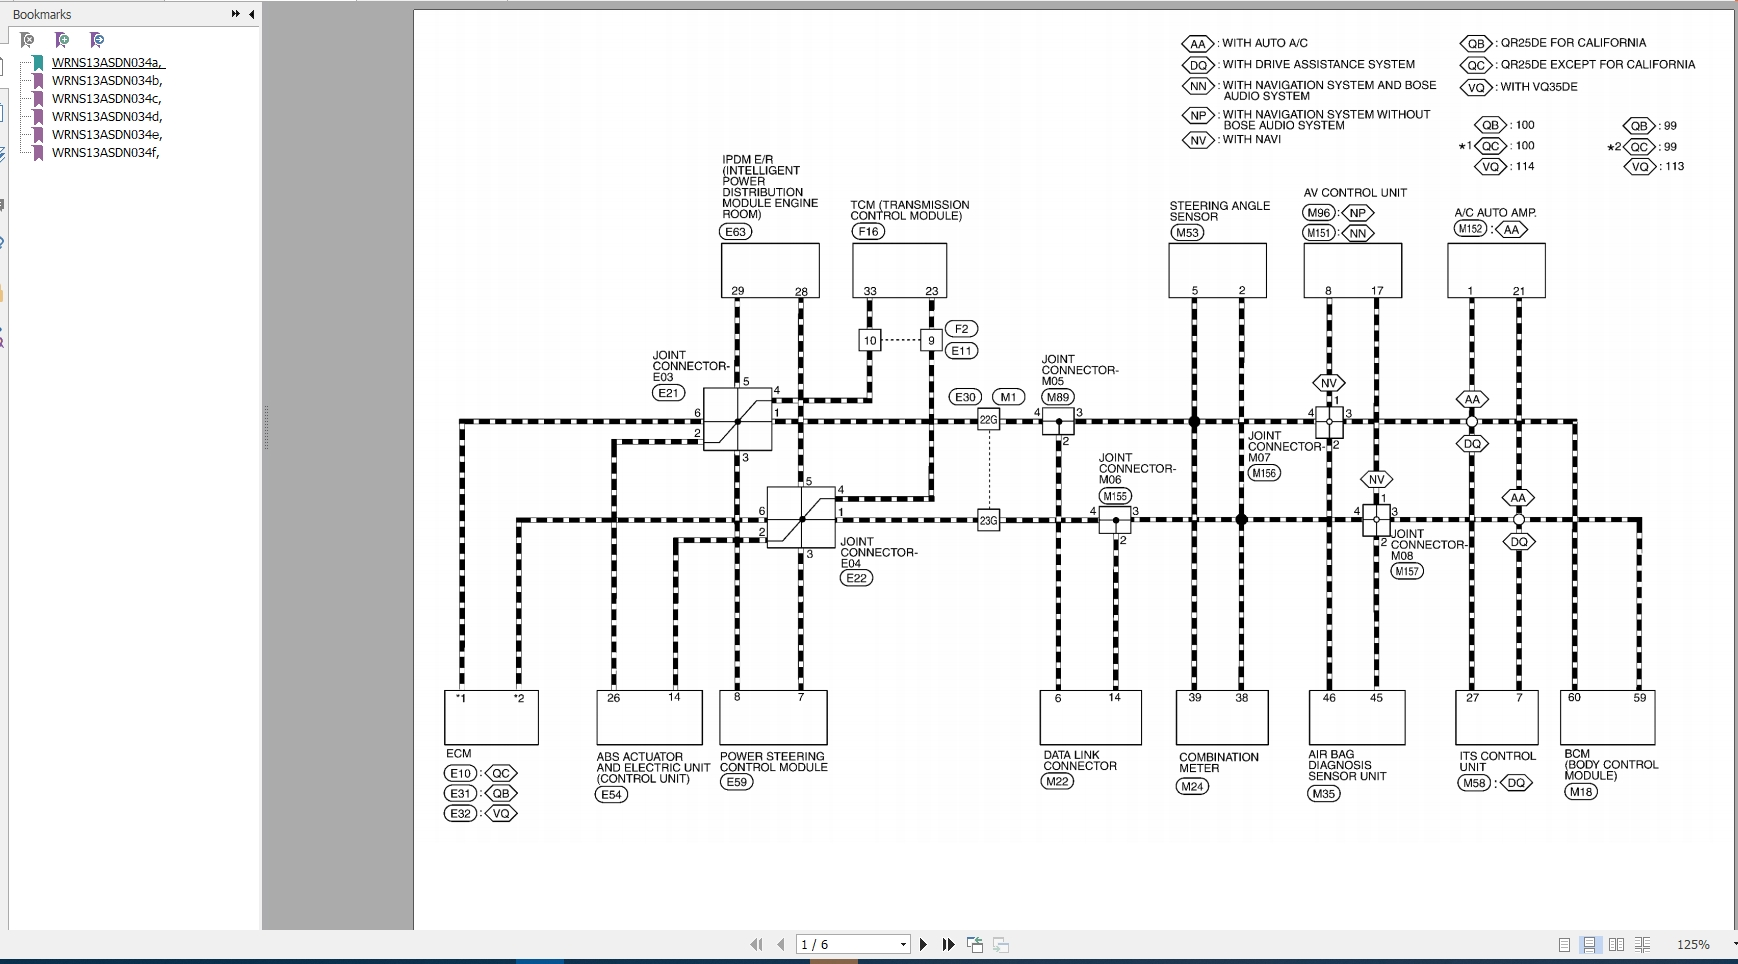 Nissan Xterra 2013 Wiring Diagram En Auto Repair Manual Forum Heavy Equipment Forums Download Repair Workshop Manual